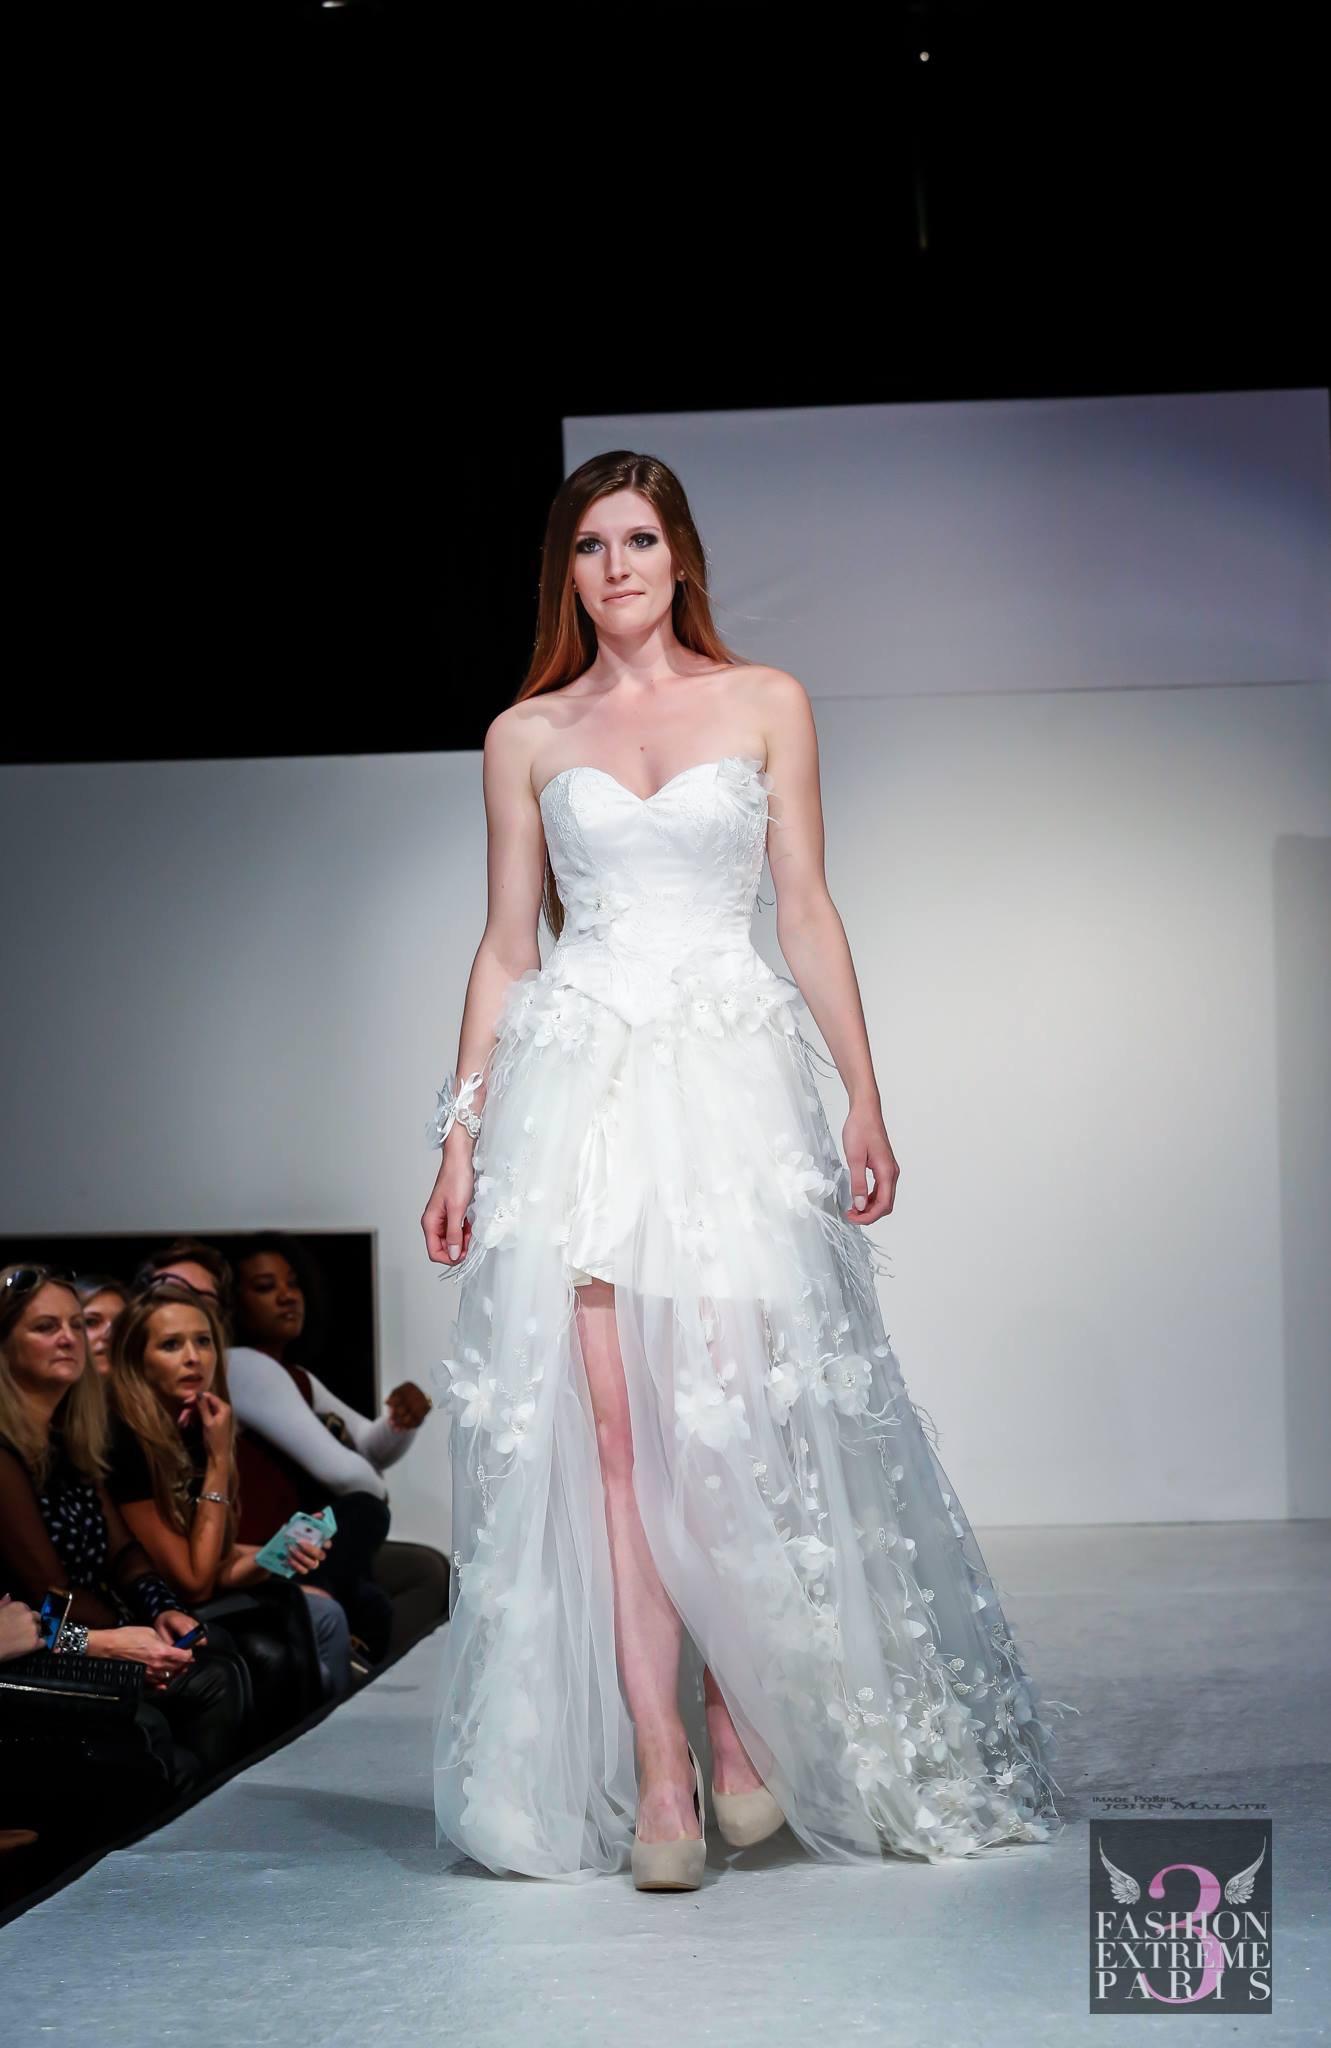 Robe de mariée corset dentelle et jupe en dentelle à fleurs relief Agnes Szabelewski photo John Malate.jpg